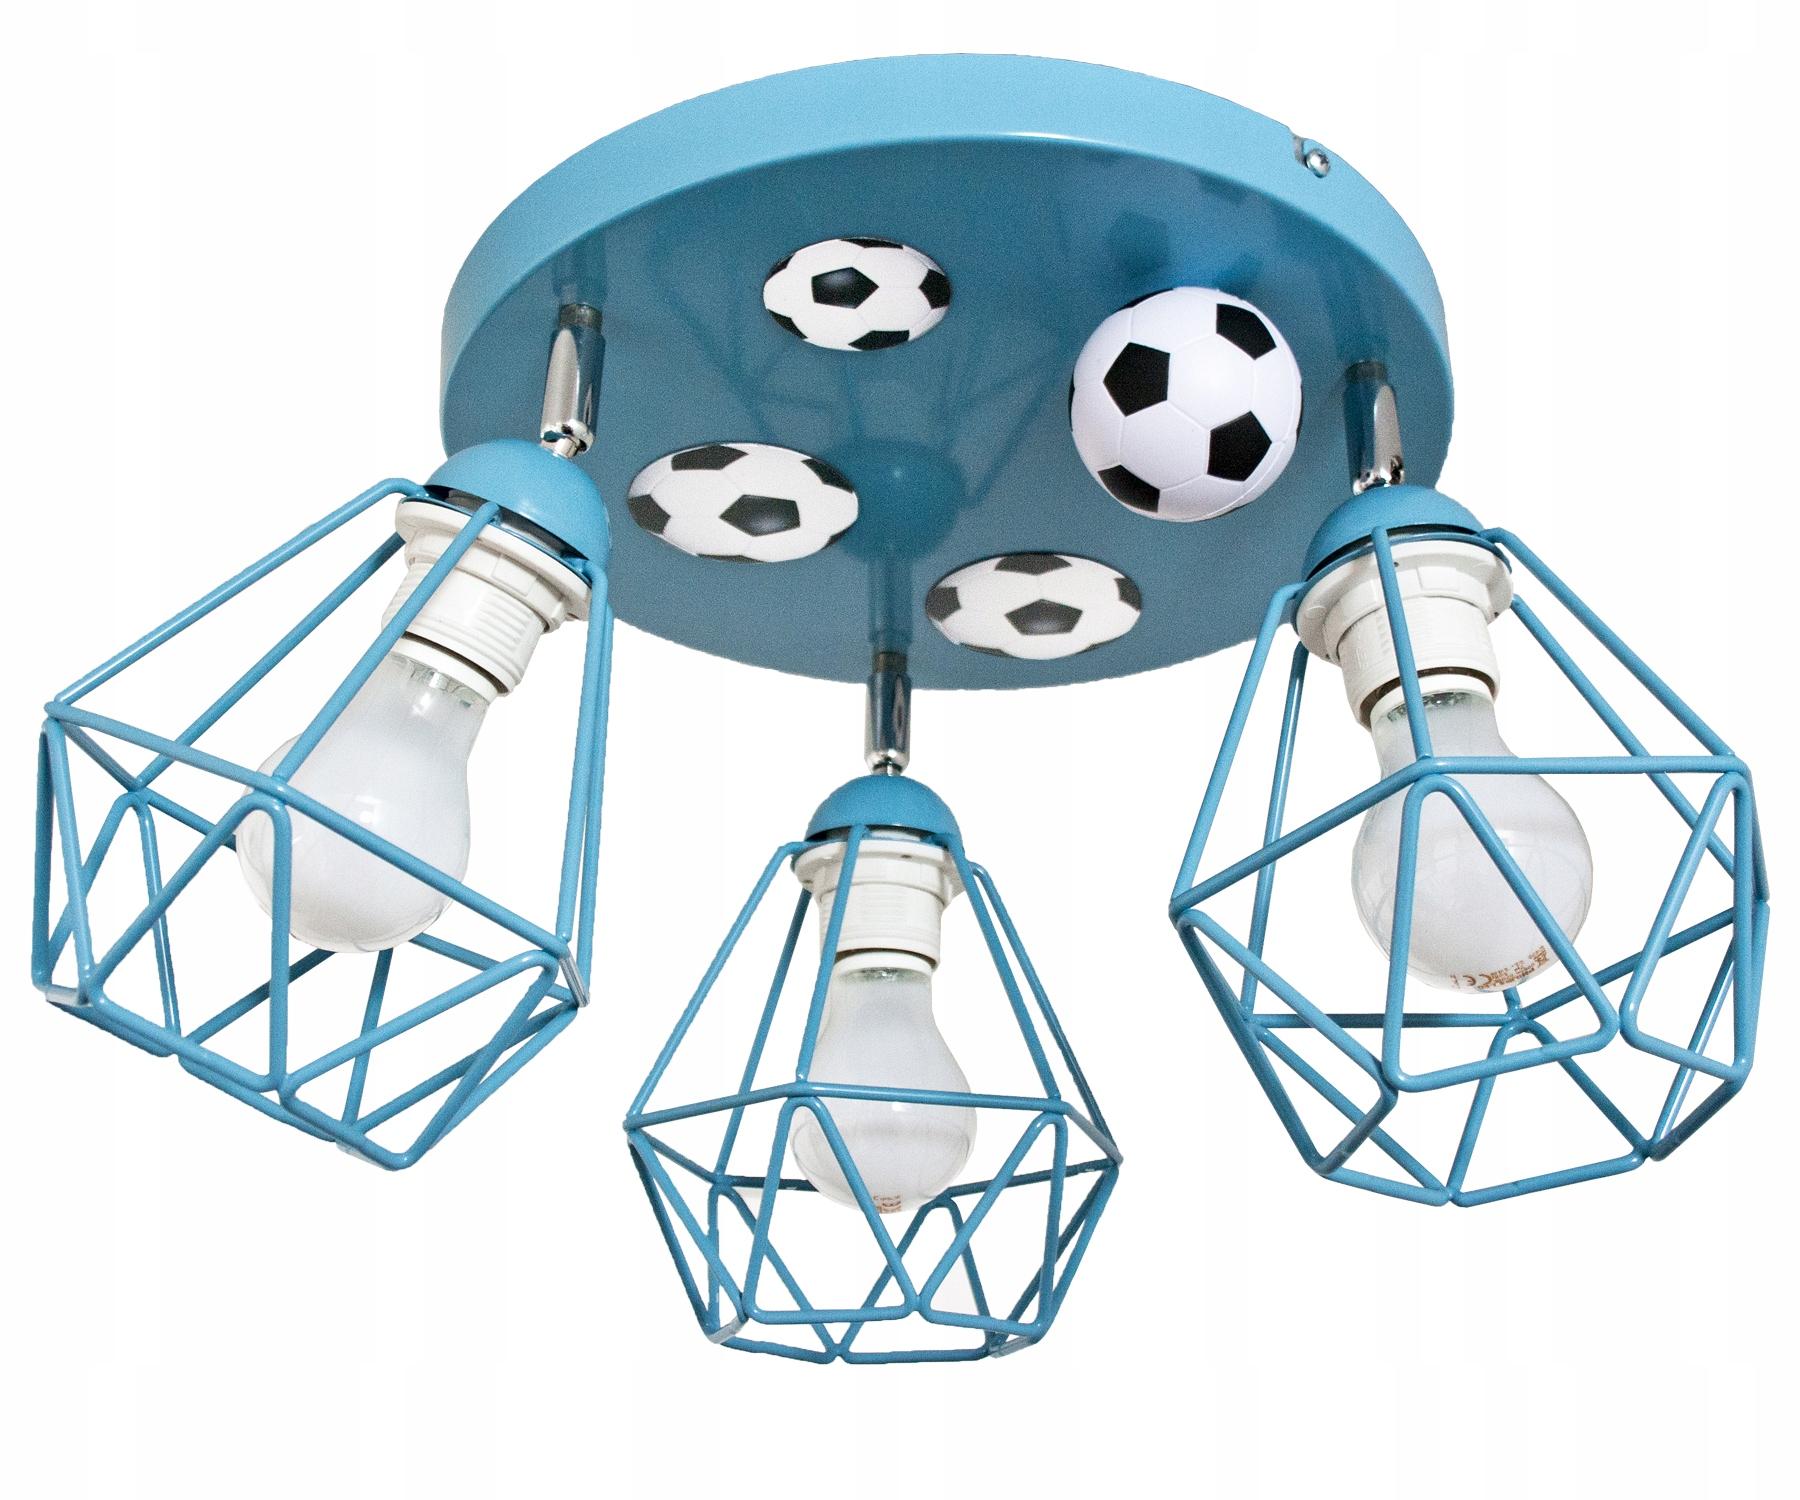 CIEKAWA Lampa sufitowa MUNDIAL 3 DIAMOND NIEBIESKI